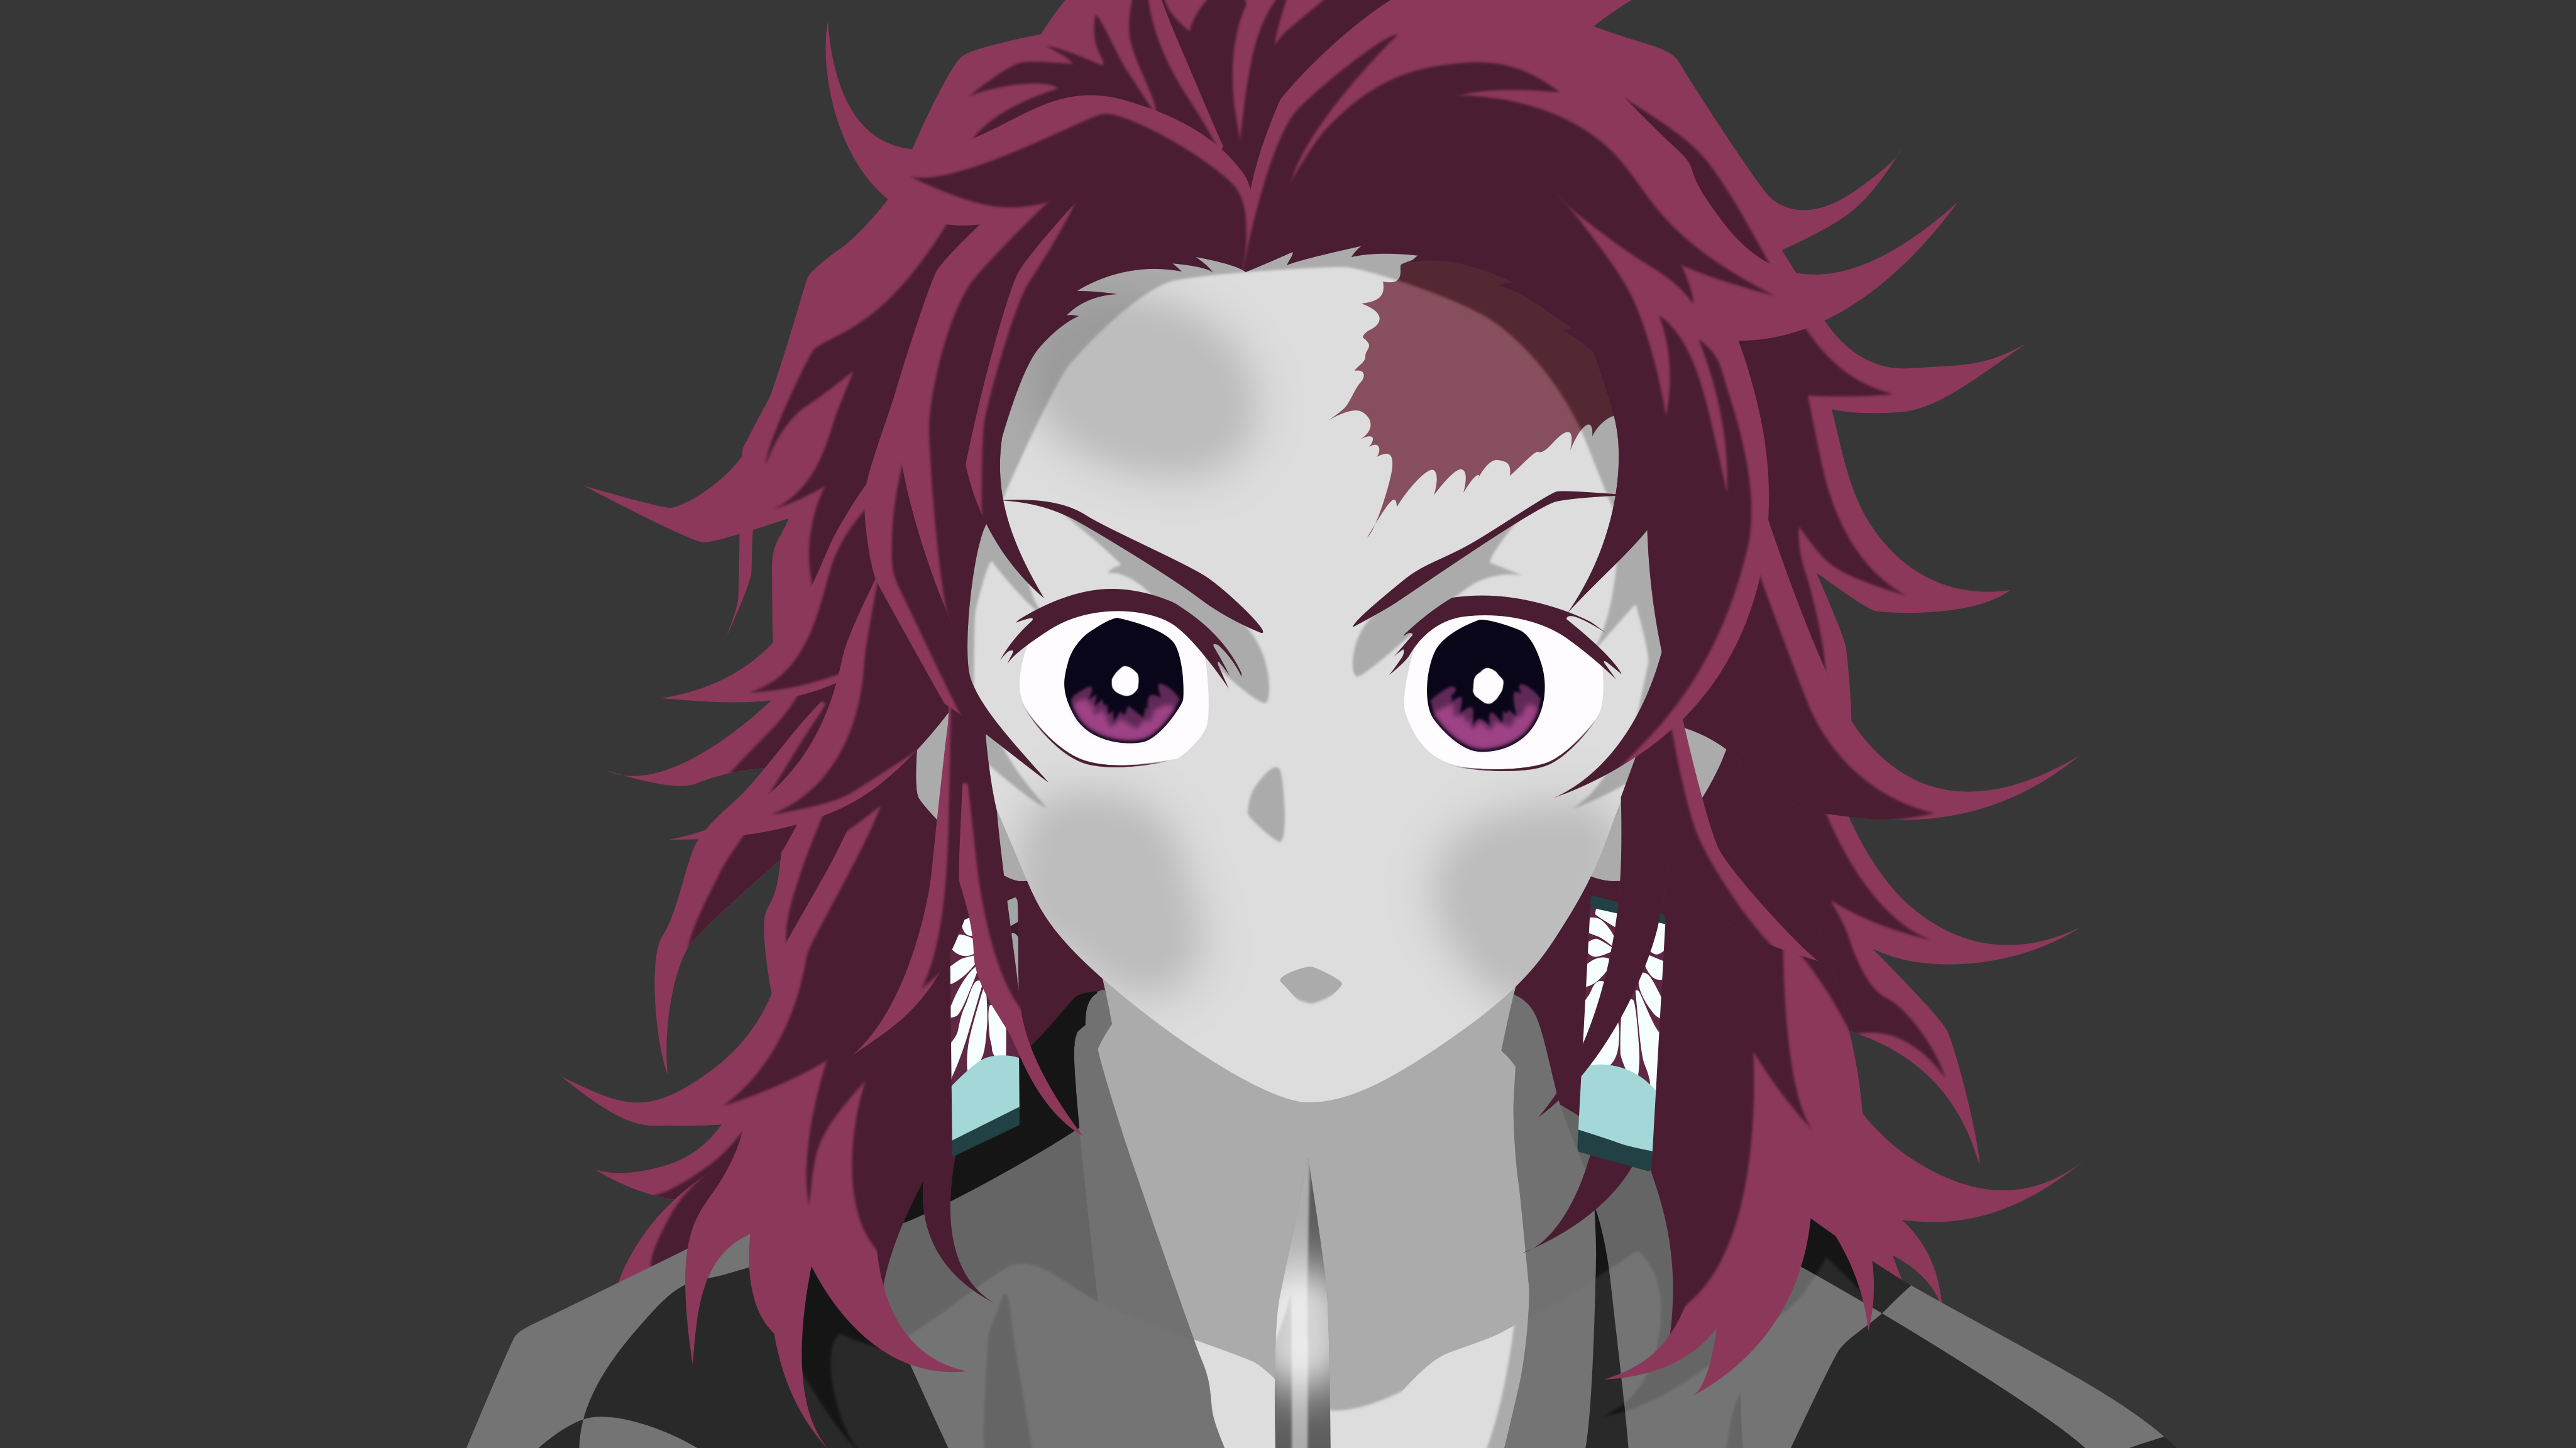 Happy Birthday Tanjiro! | Anime images, Anime, Art